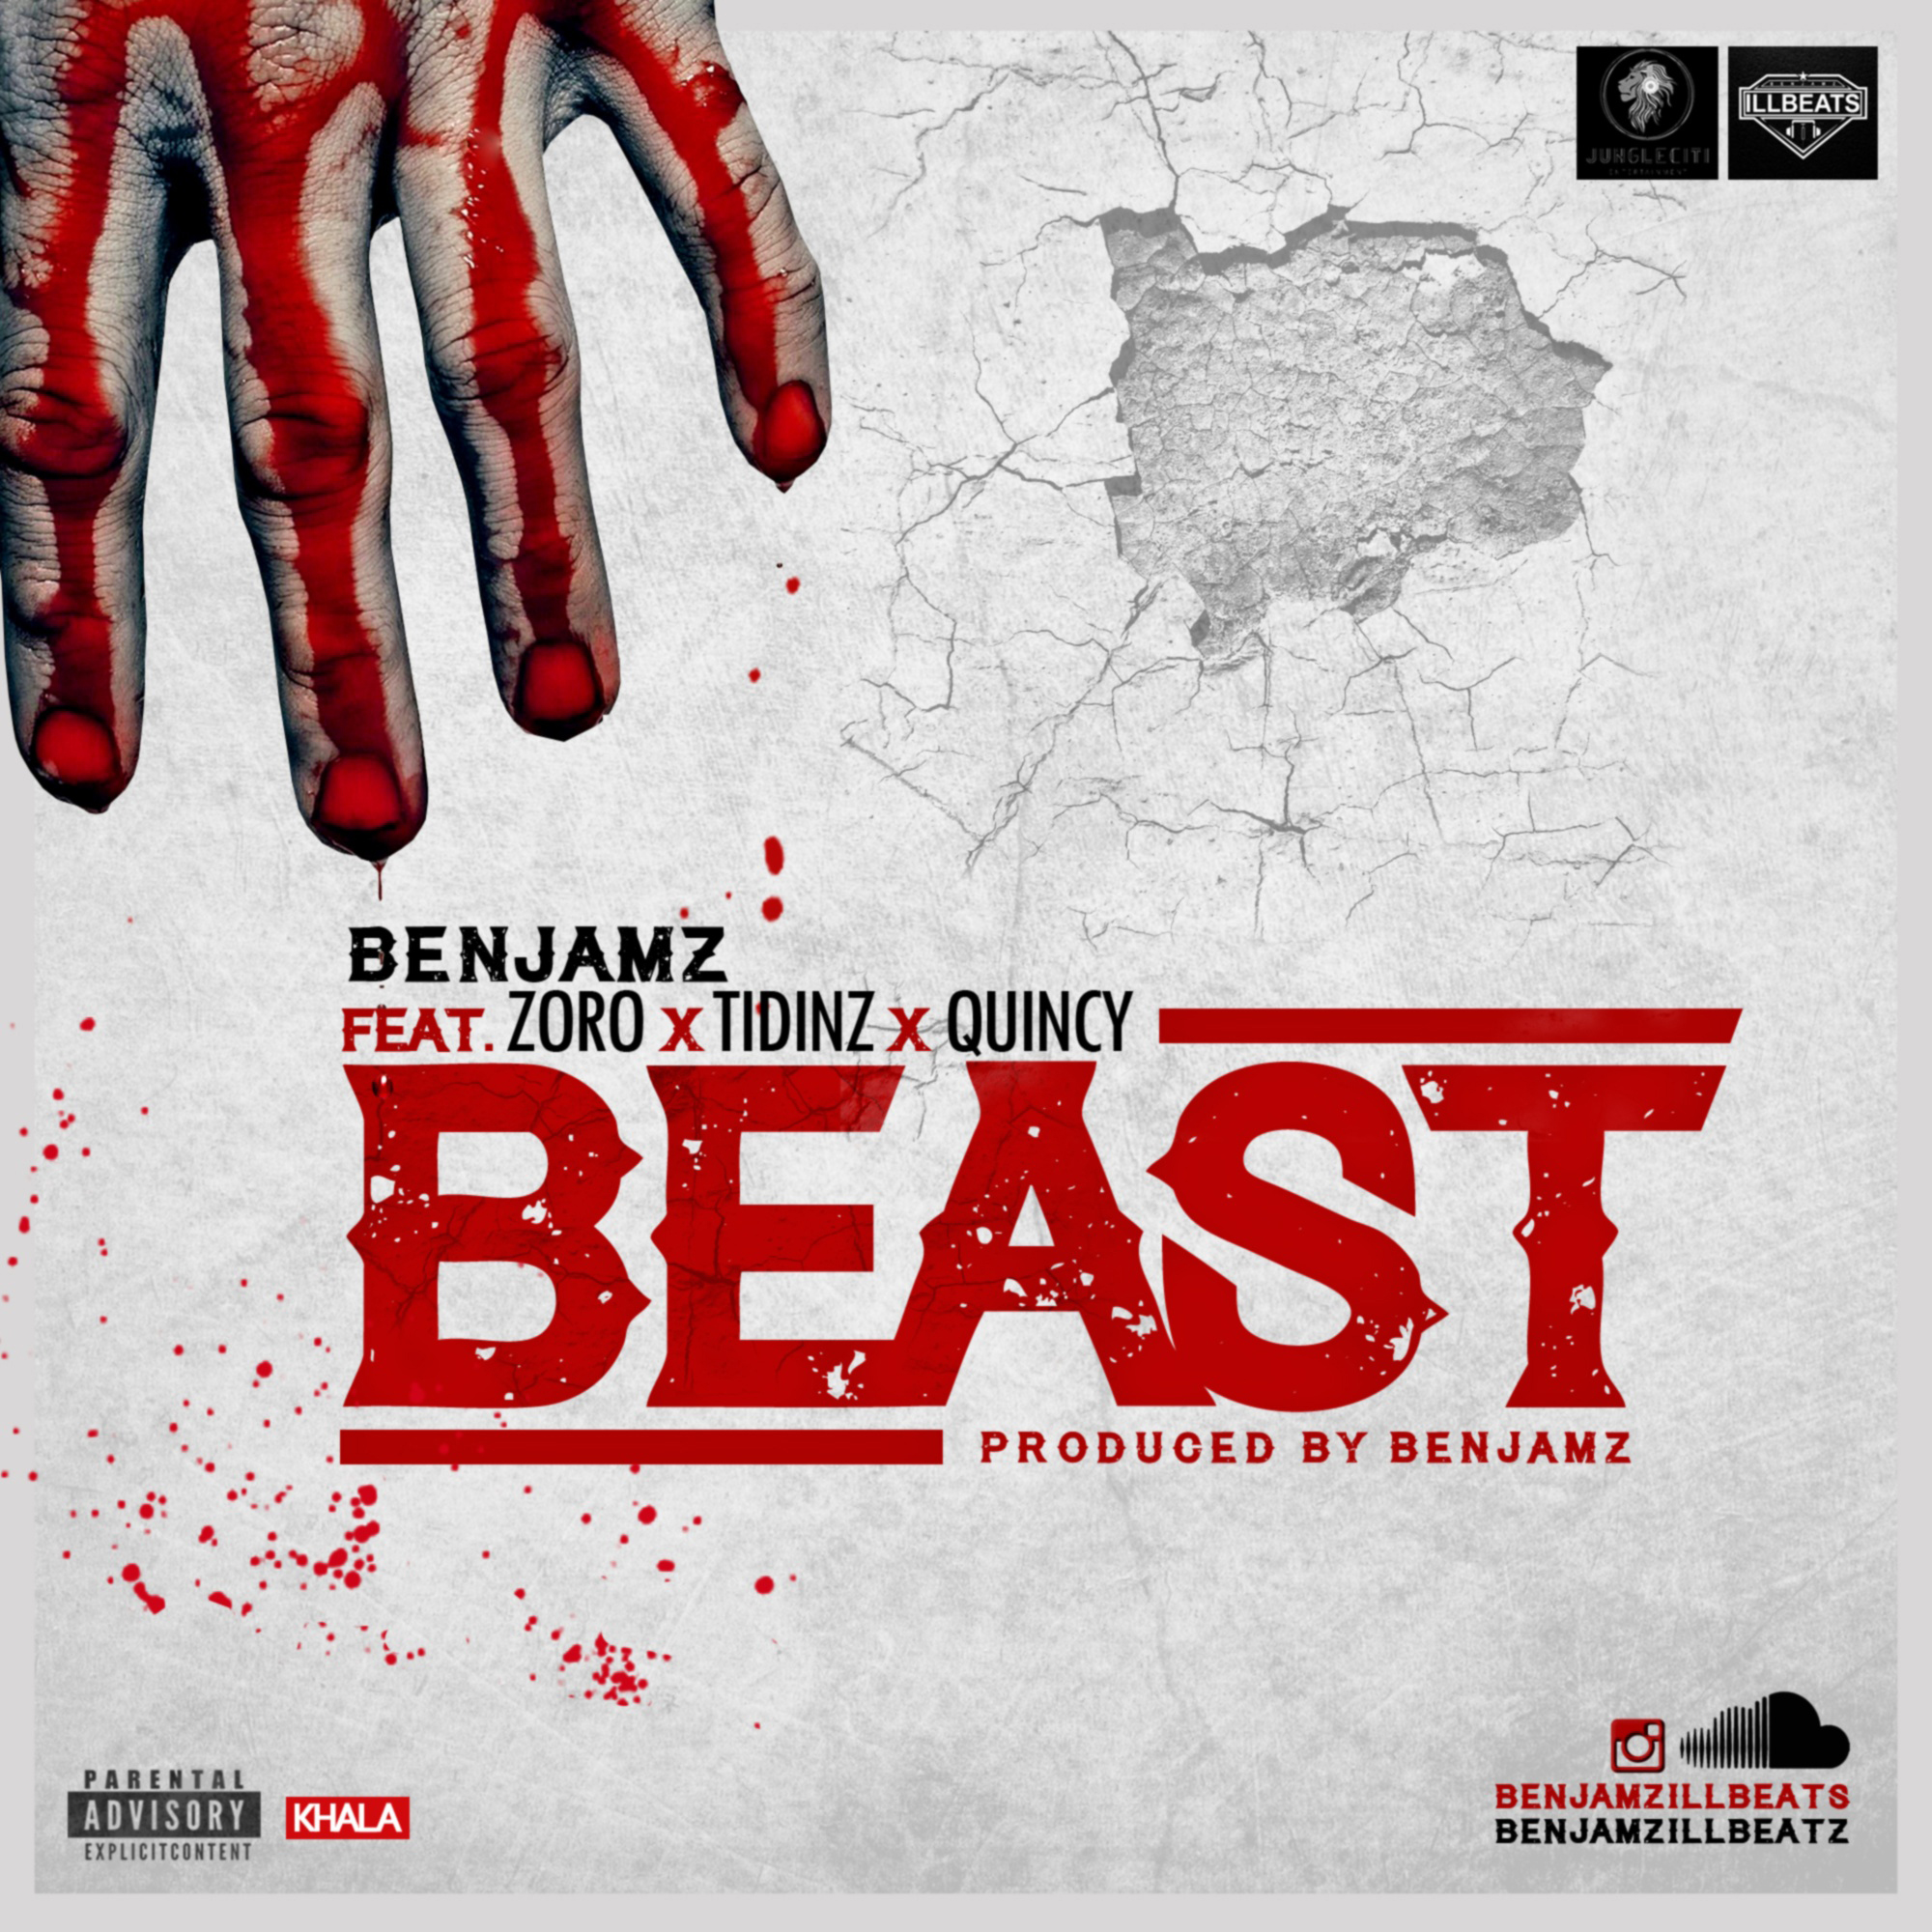 http://notjustok.com/wp-content/uploads/2015/09/ATT_1442774610516_banjamz-beast-2000-x2000.jpg